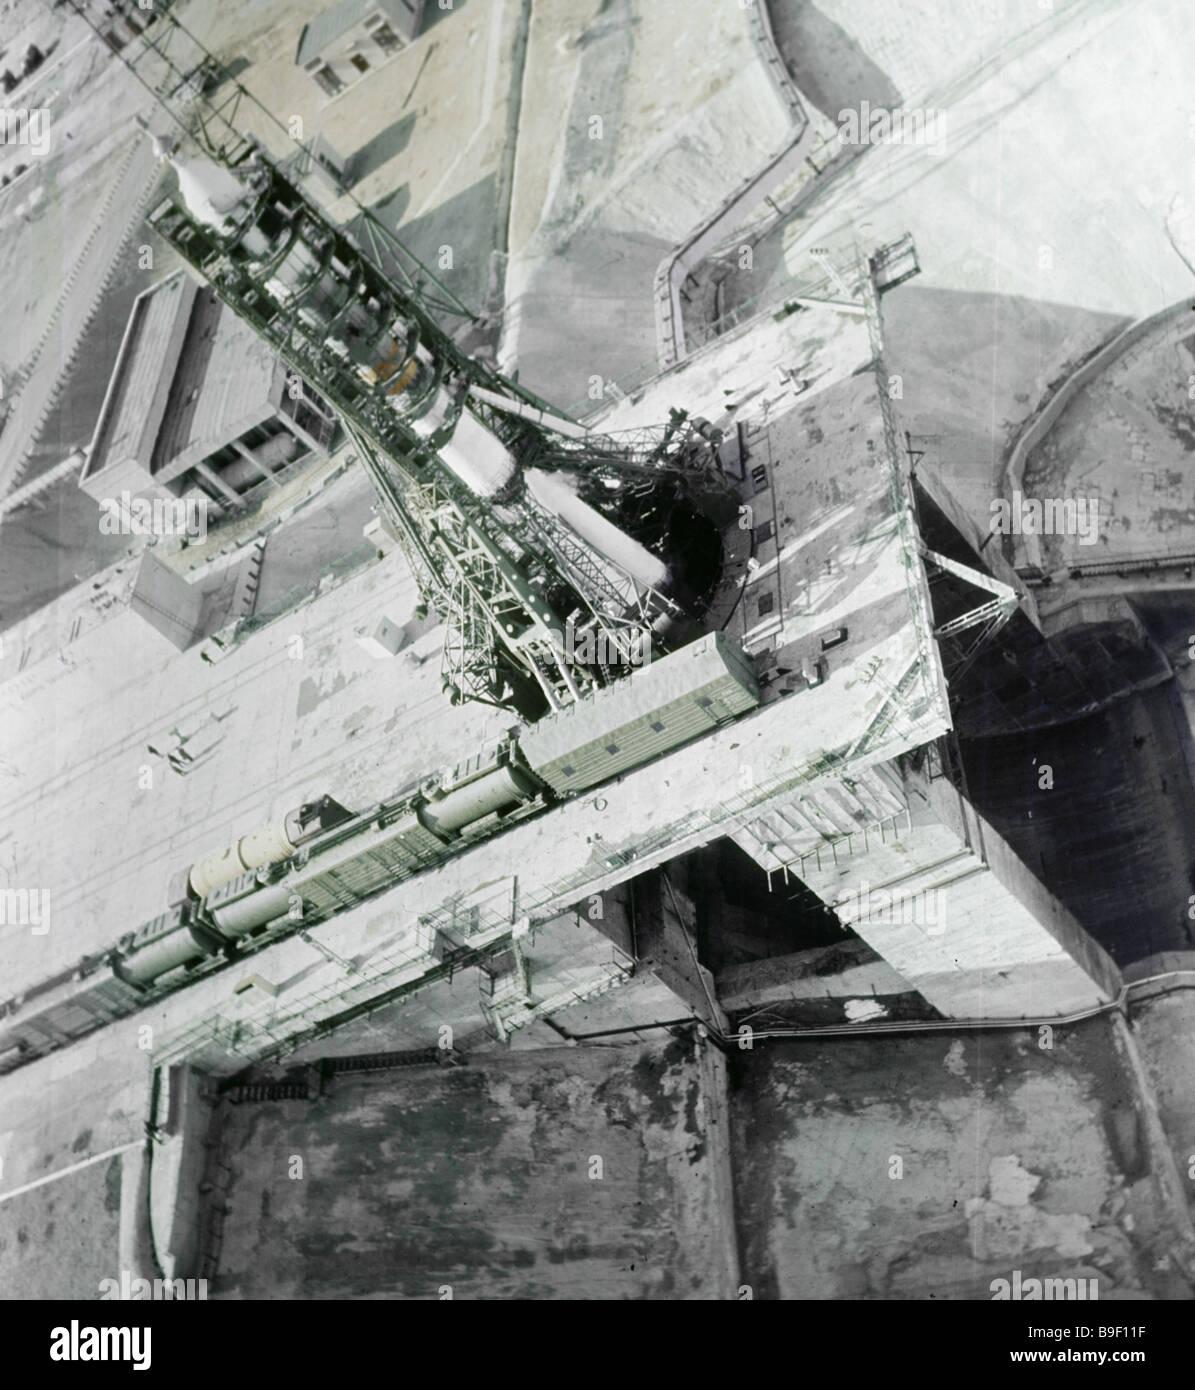 Launch site on the Baikonur cosmodrome - Stock Image